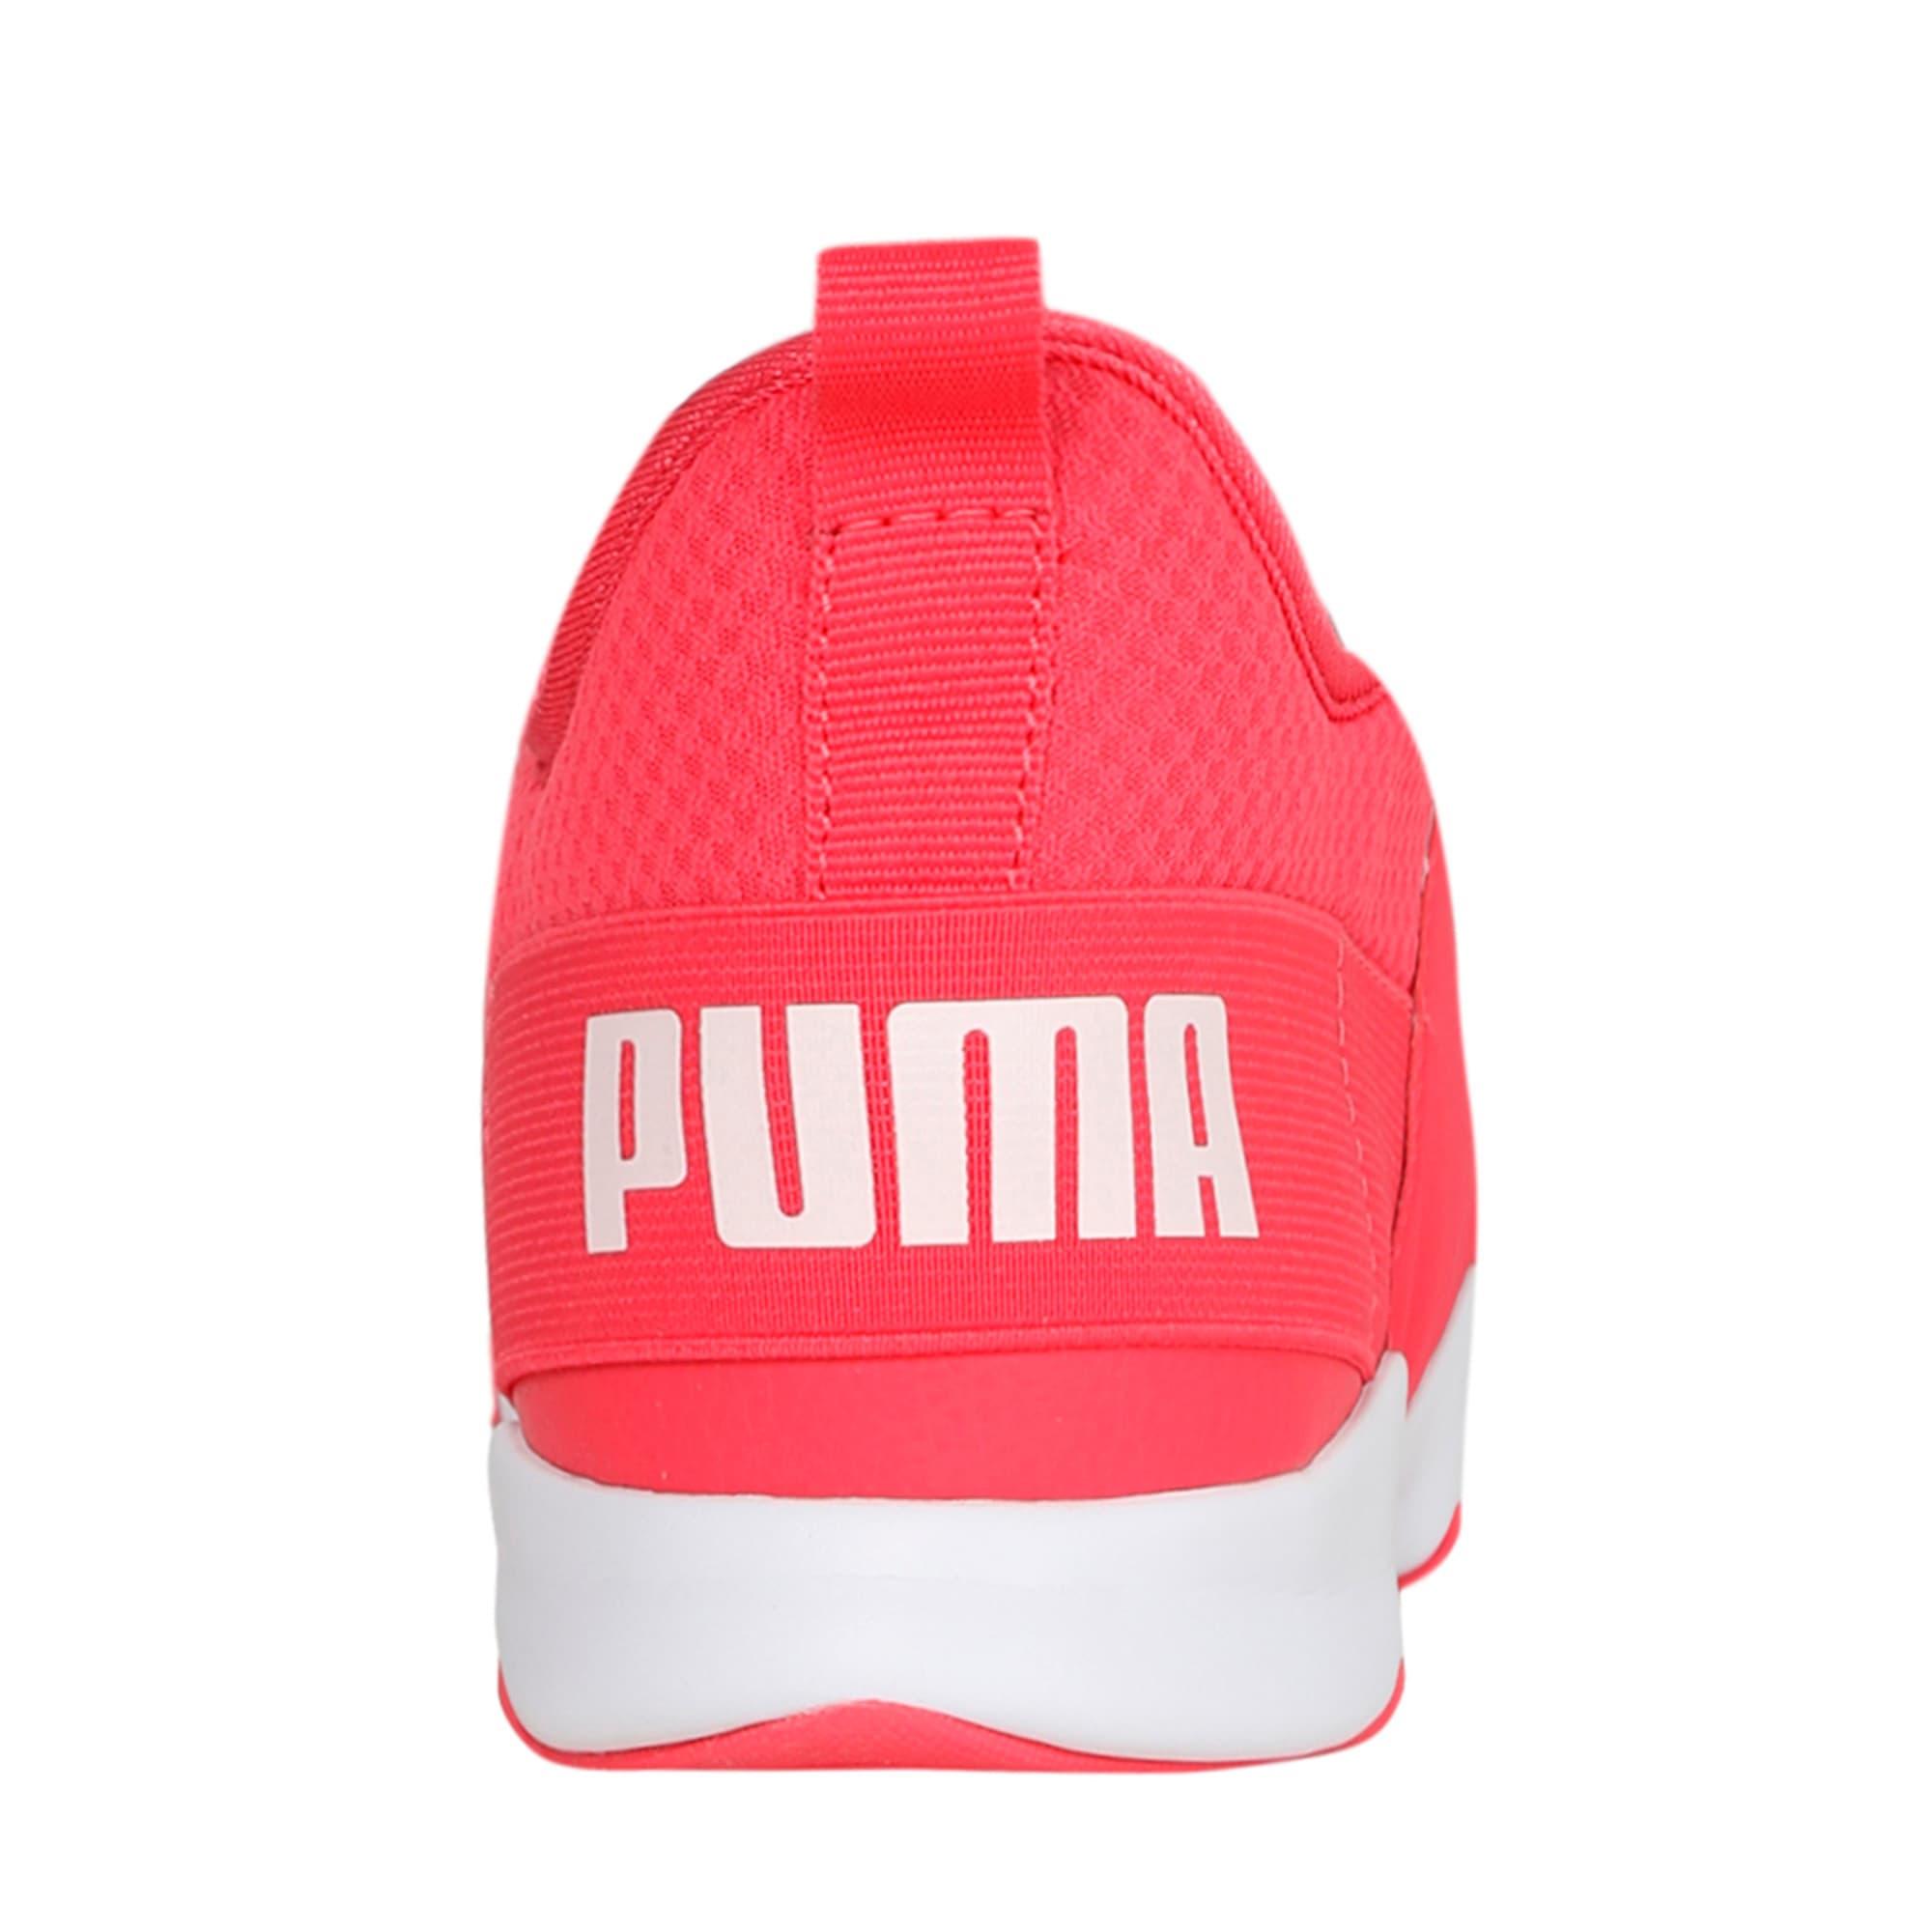 Thumbnail 3 of Puma Dare Trainer Jr, Paradise Pink-Pearl, medium-IND